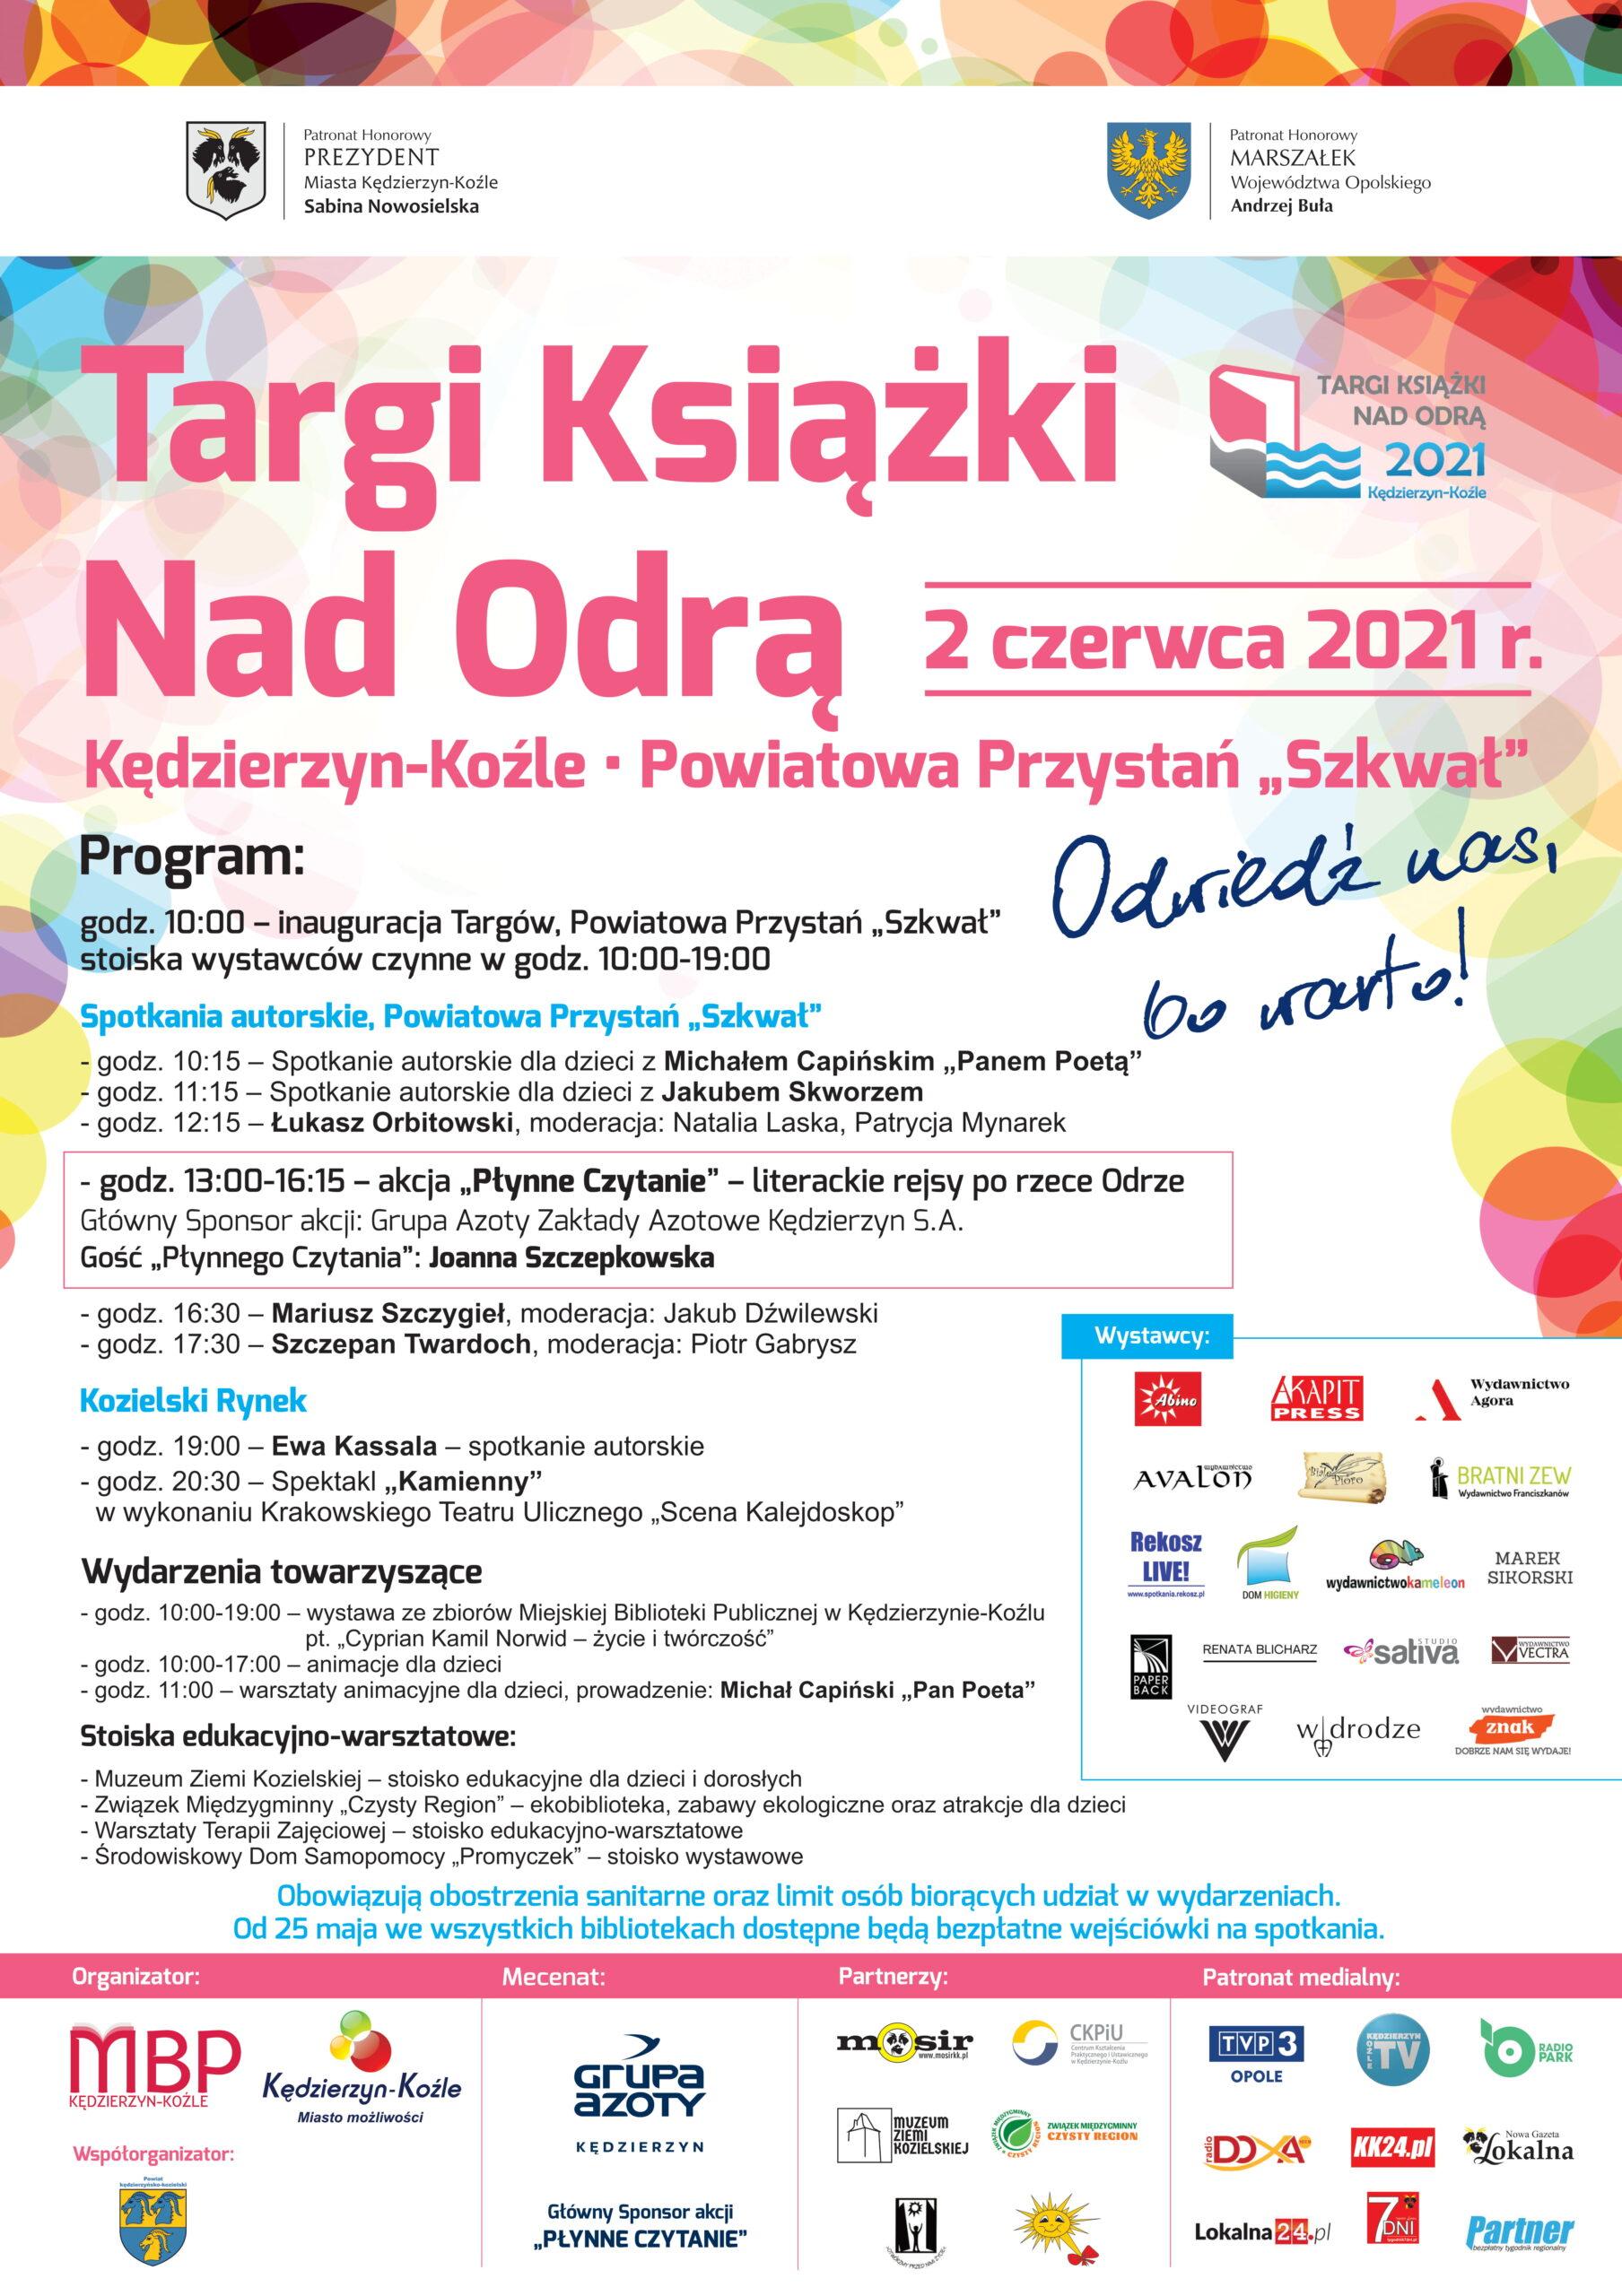 Targi Książki Nad Odrą 2021. Program